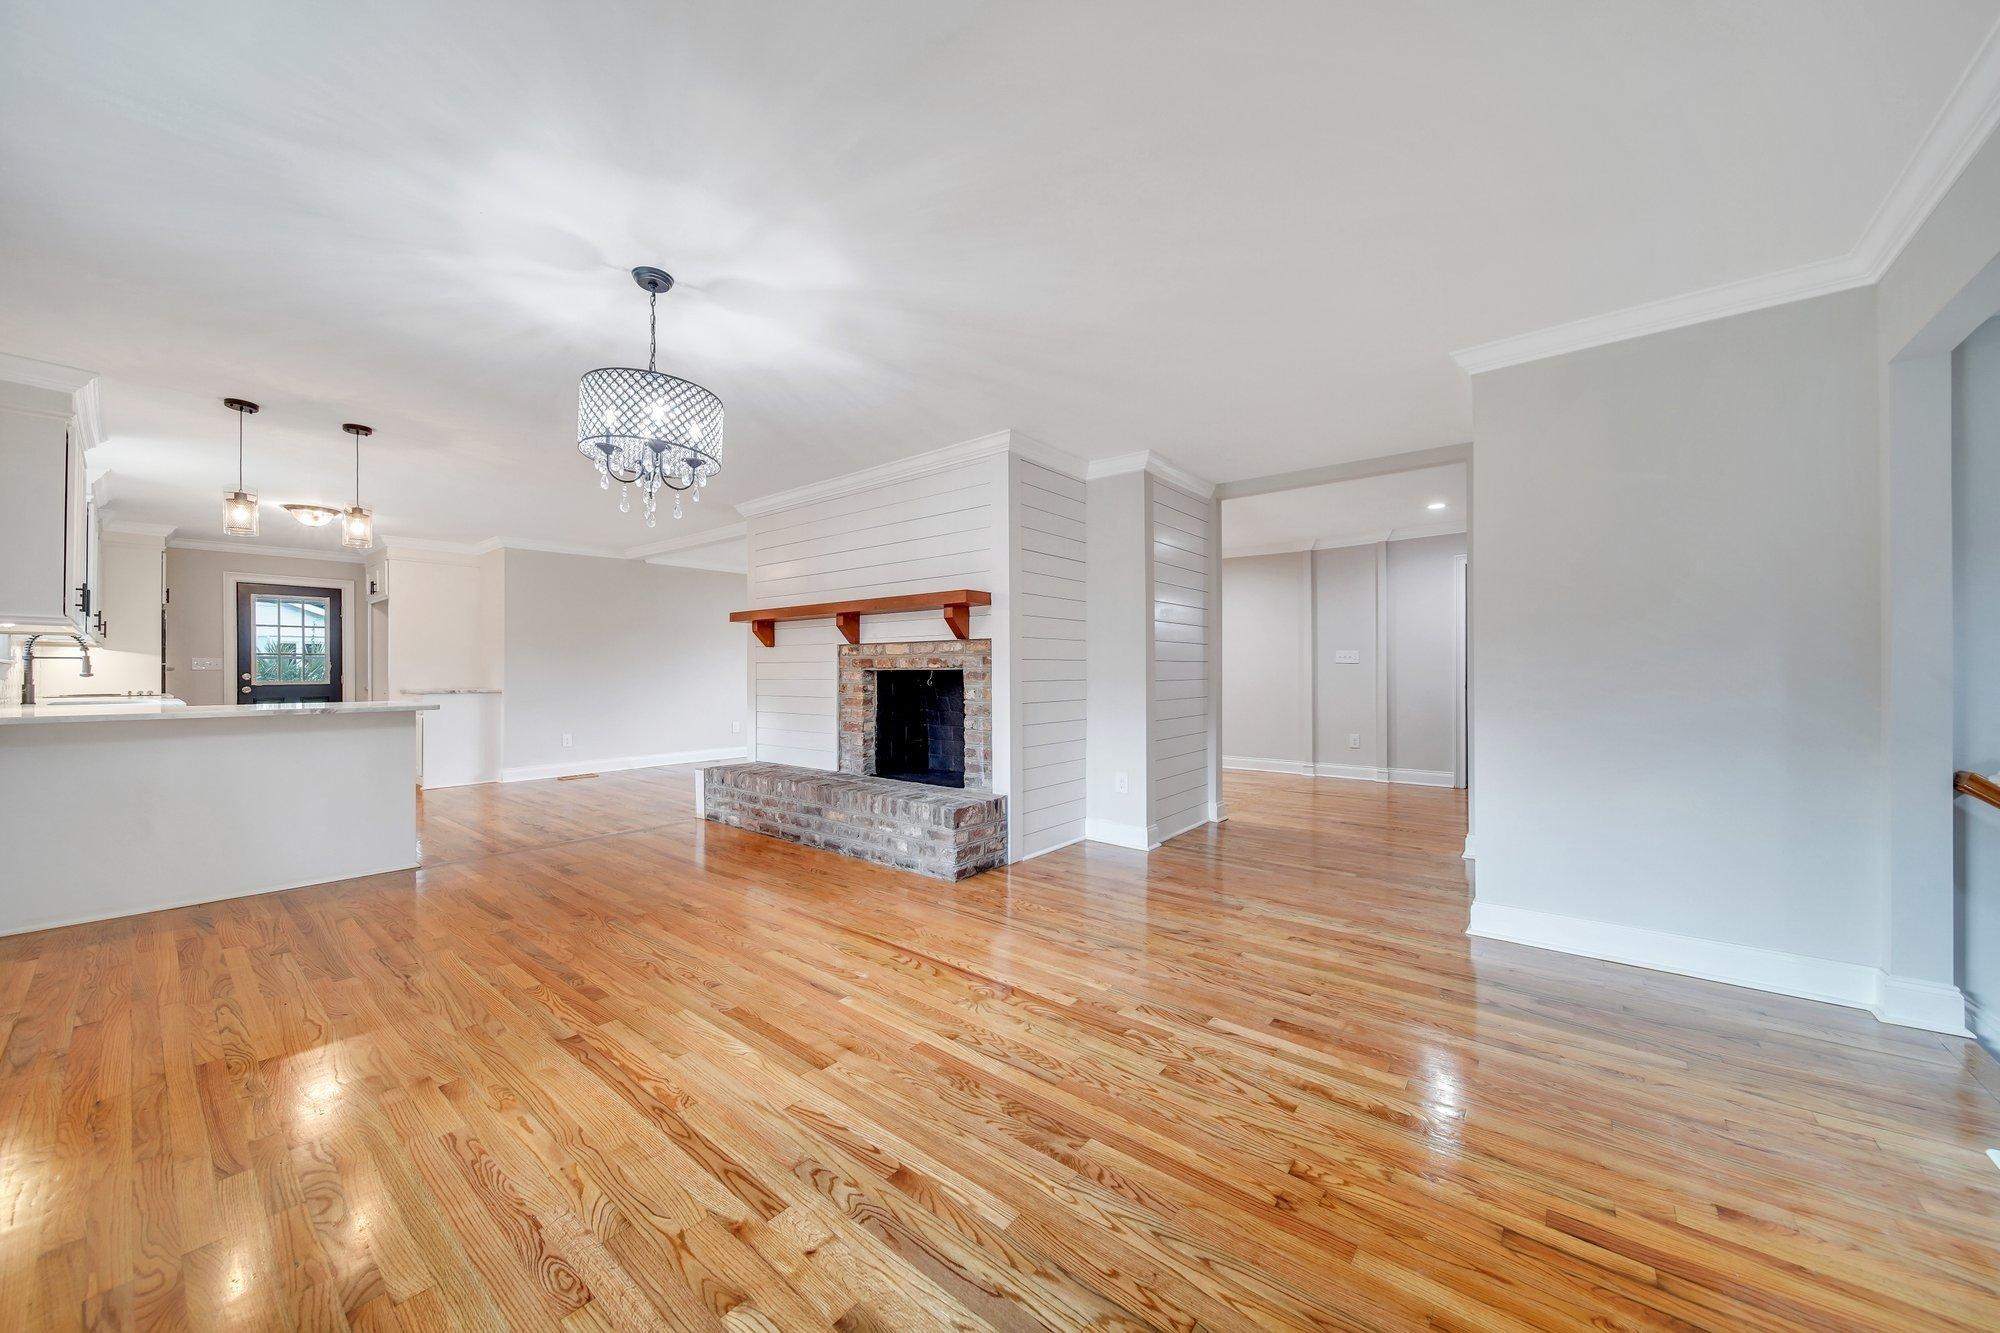 Country Club II Homes For Sale - 1477 Burningtree, Charleston, SC - 3